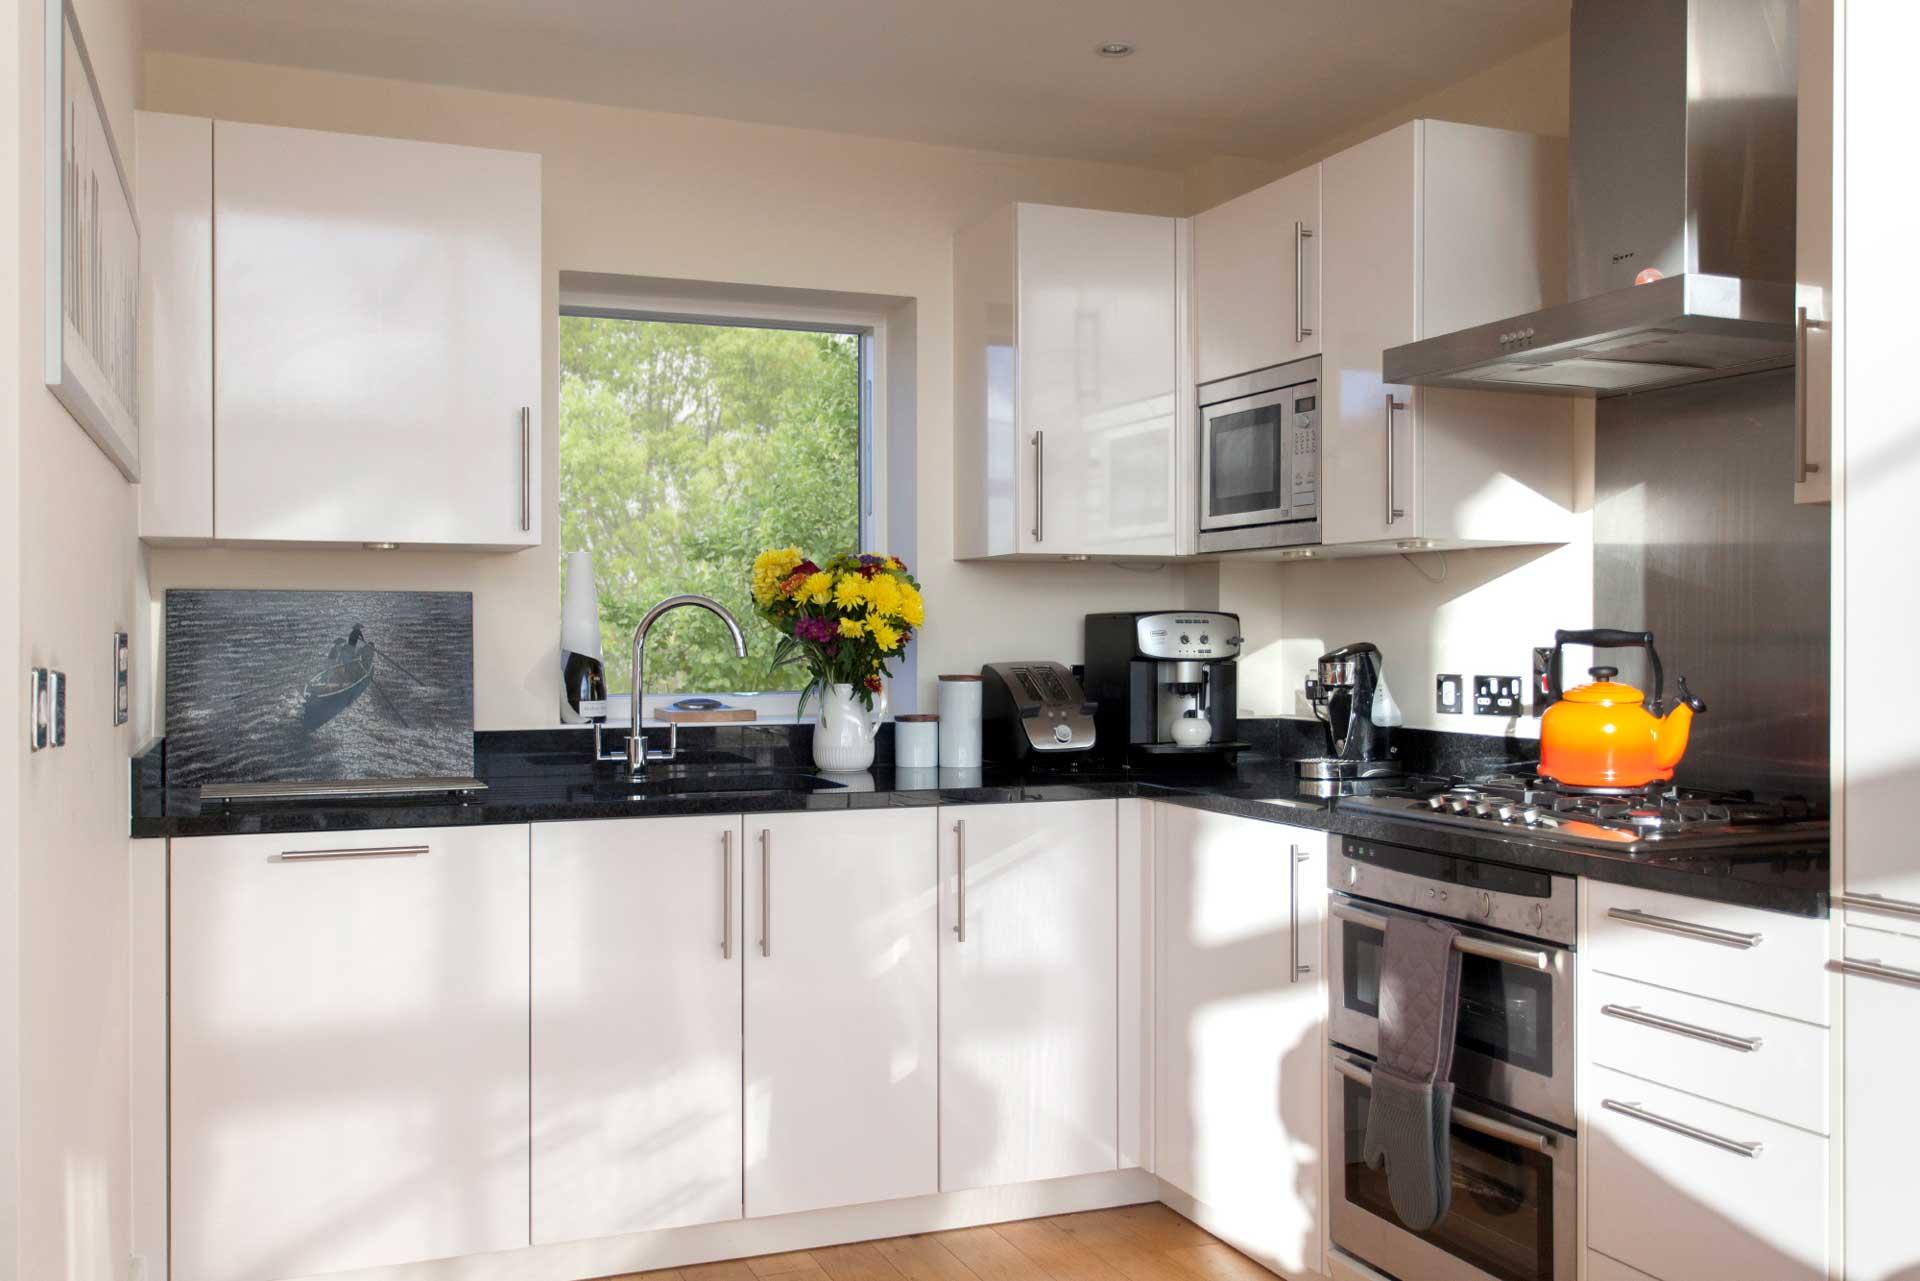 Howells-Mere-3-Lower-Mill-Estate-Rentals-Kitchen-1a